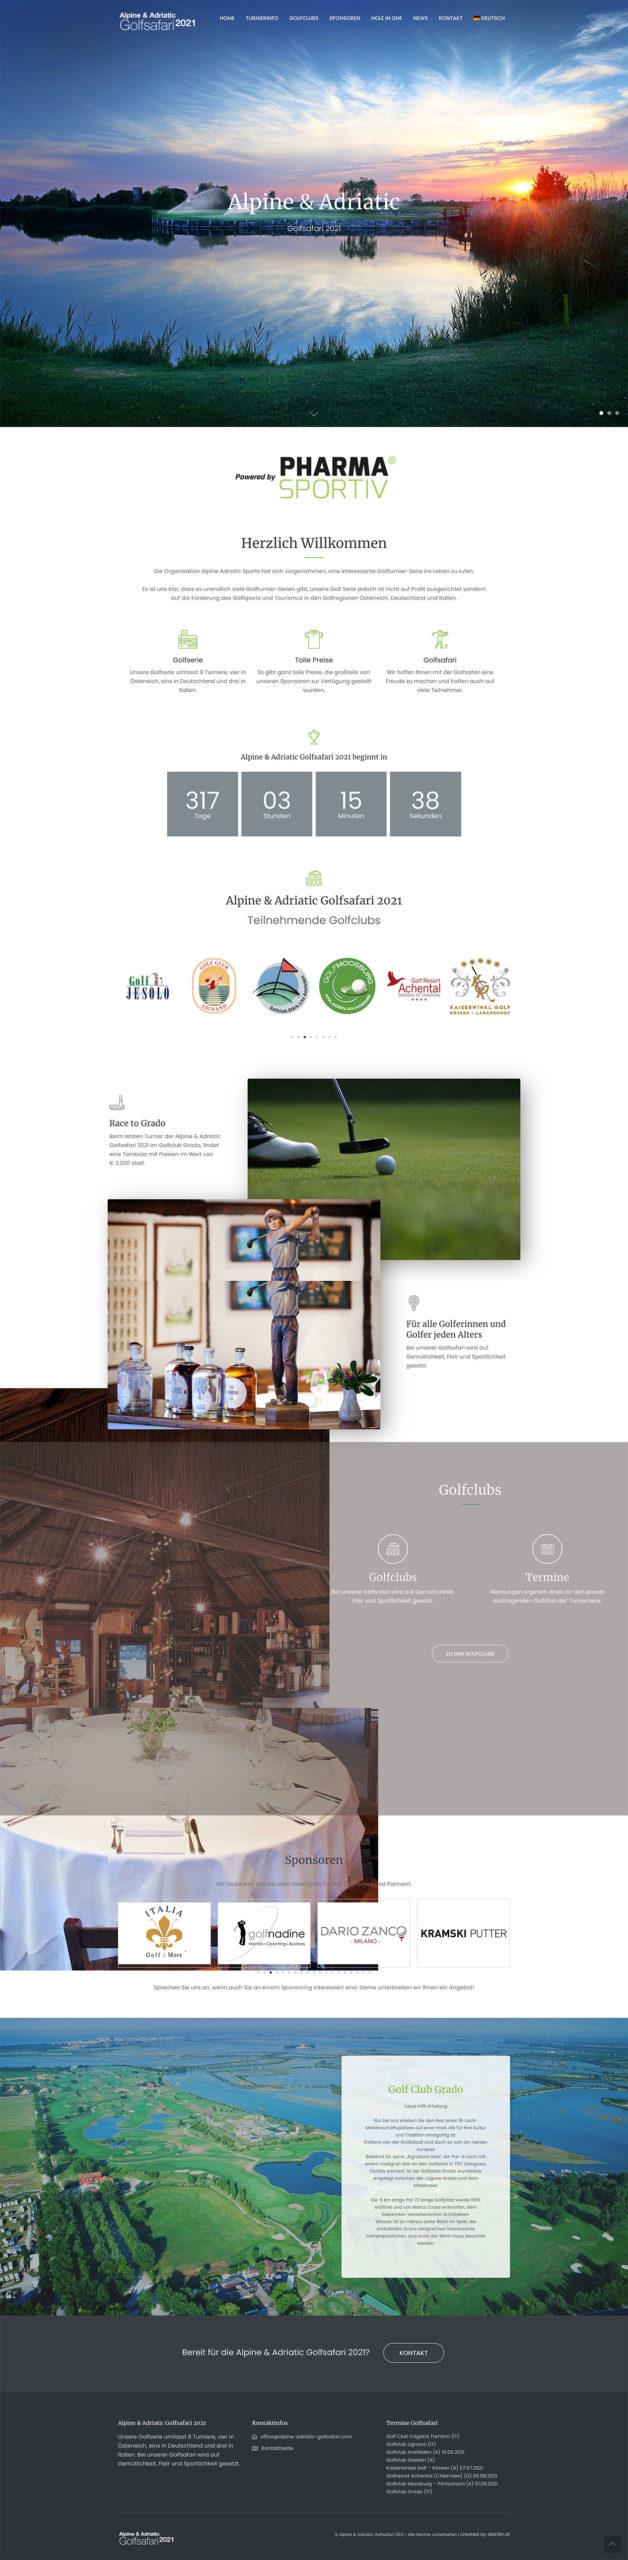 Kunde Alpine & Adriatic Golfsafari 2021